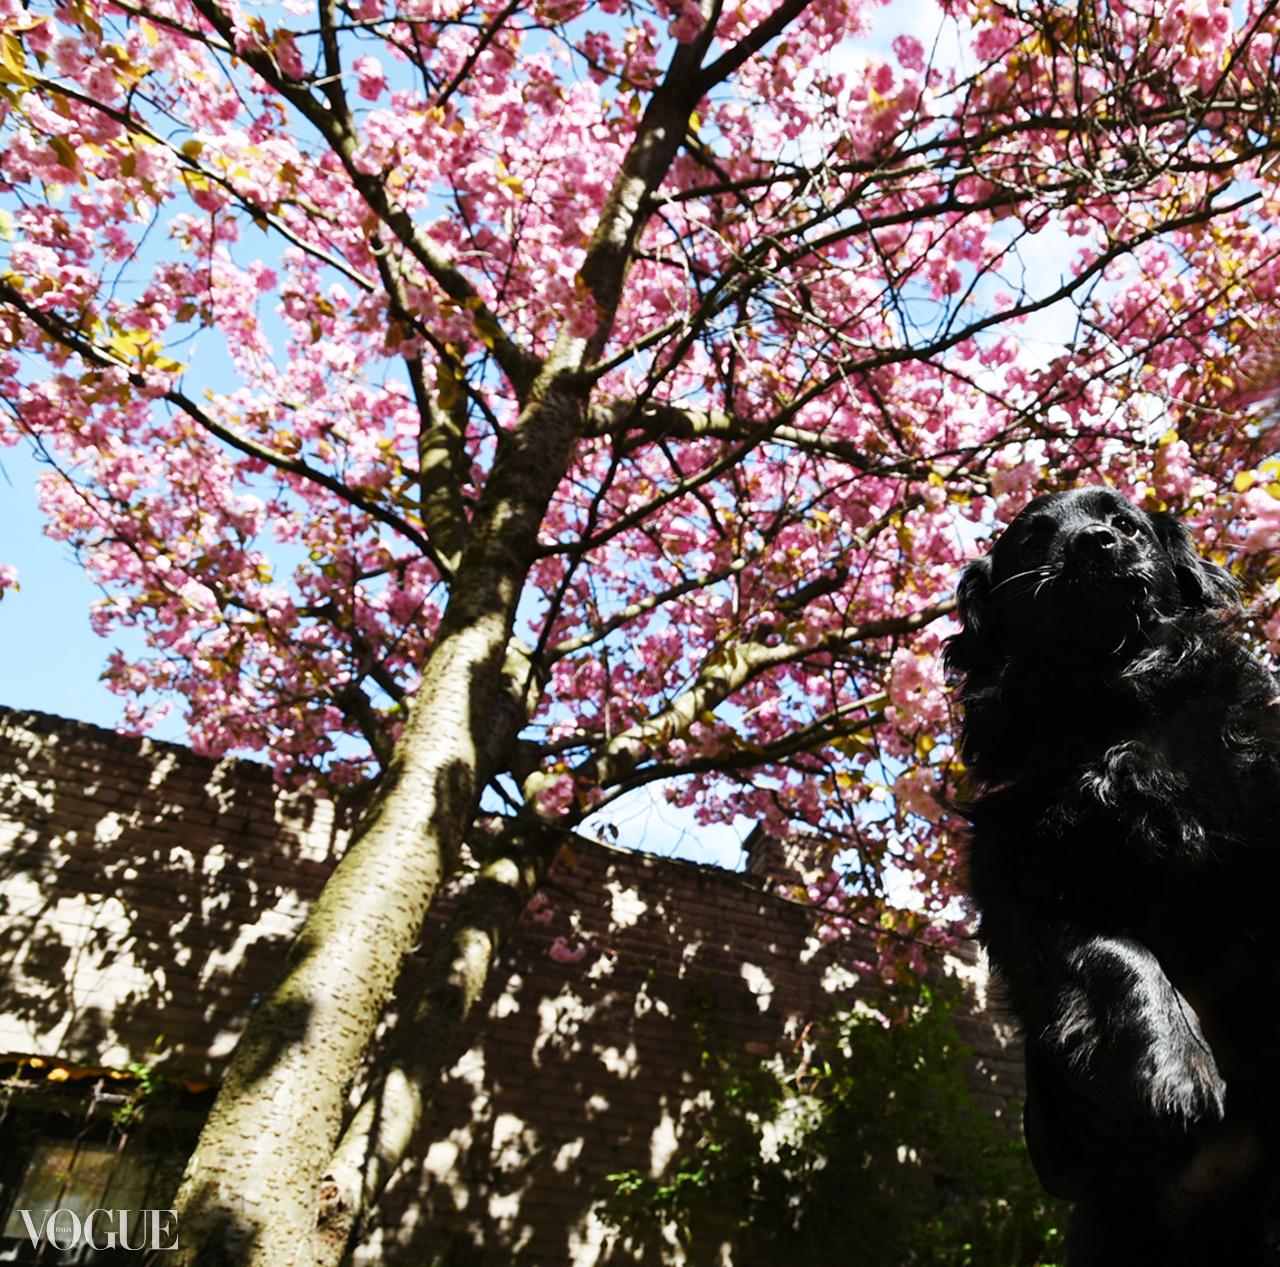 BEAR ON VOGUE ITALIA'S PHOTOVOGUE